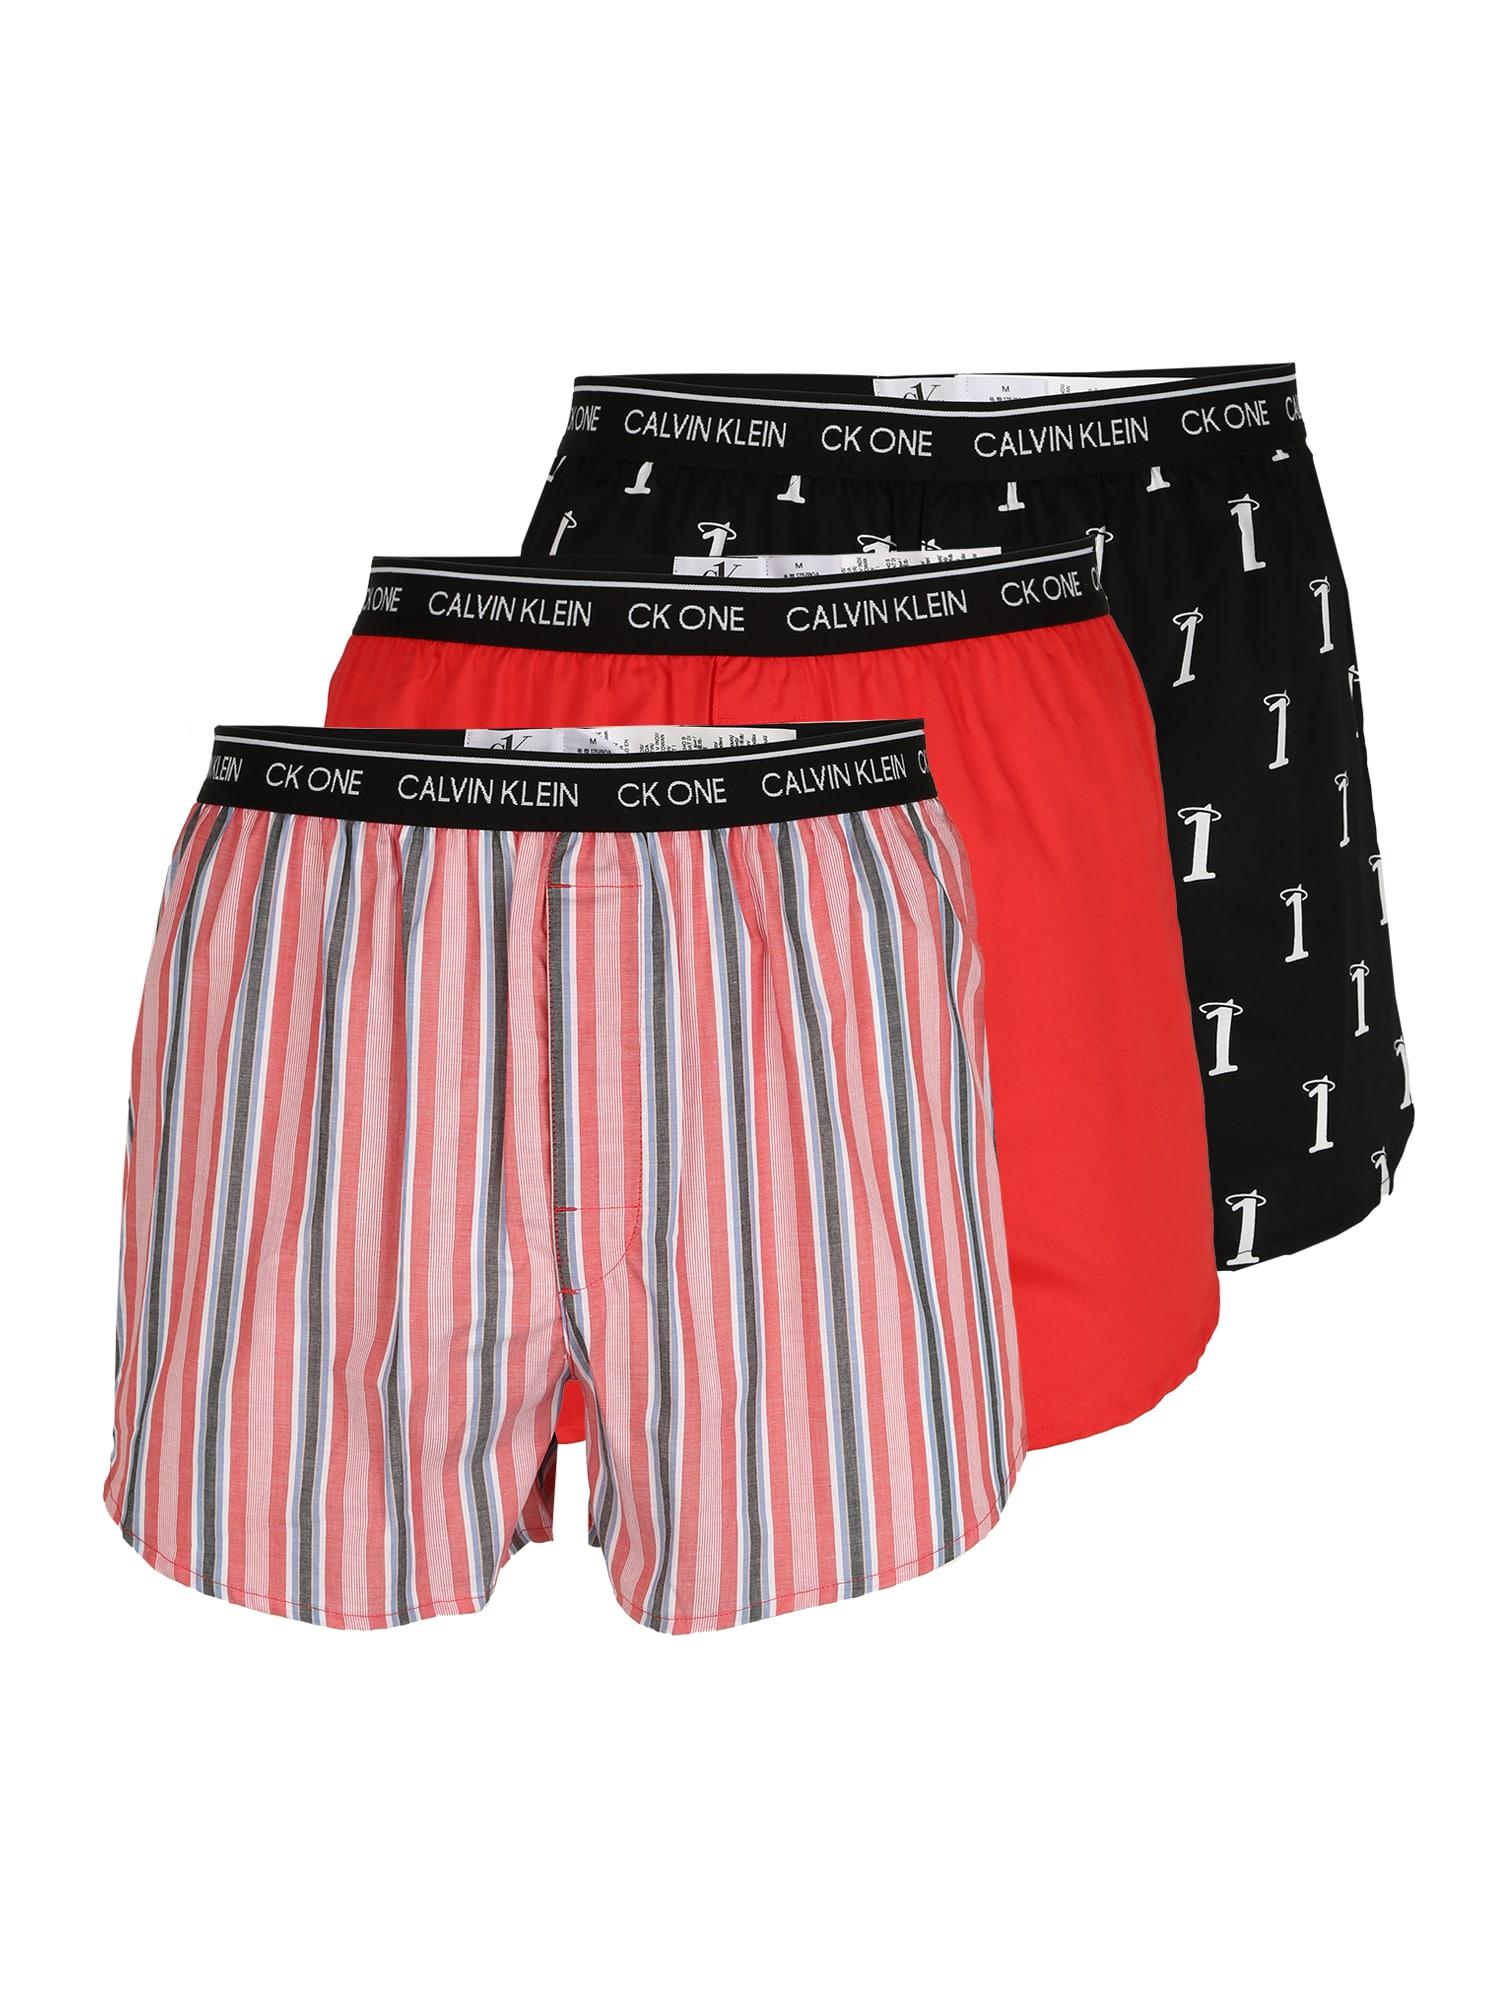 Calvin Klein Underwear Boxer trumpikės juoda / balta / raudona